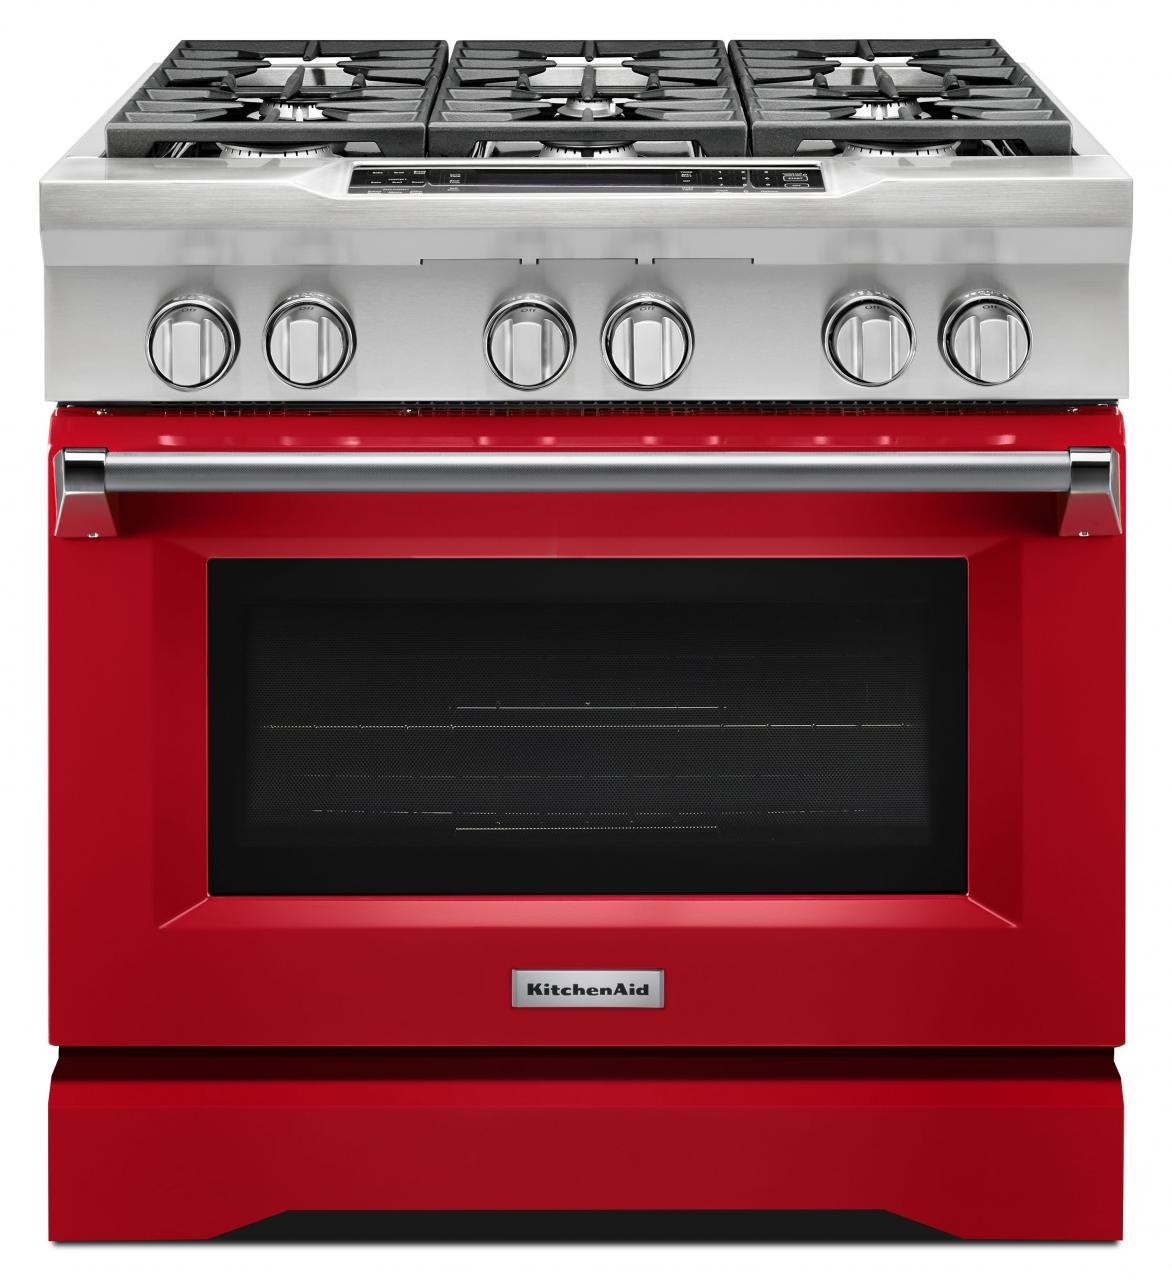 Kitchenaid Commercial Style 36 Pro Dual Fuel Range Signature Red Kdrs467vsd